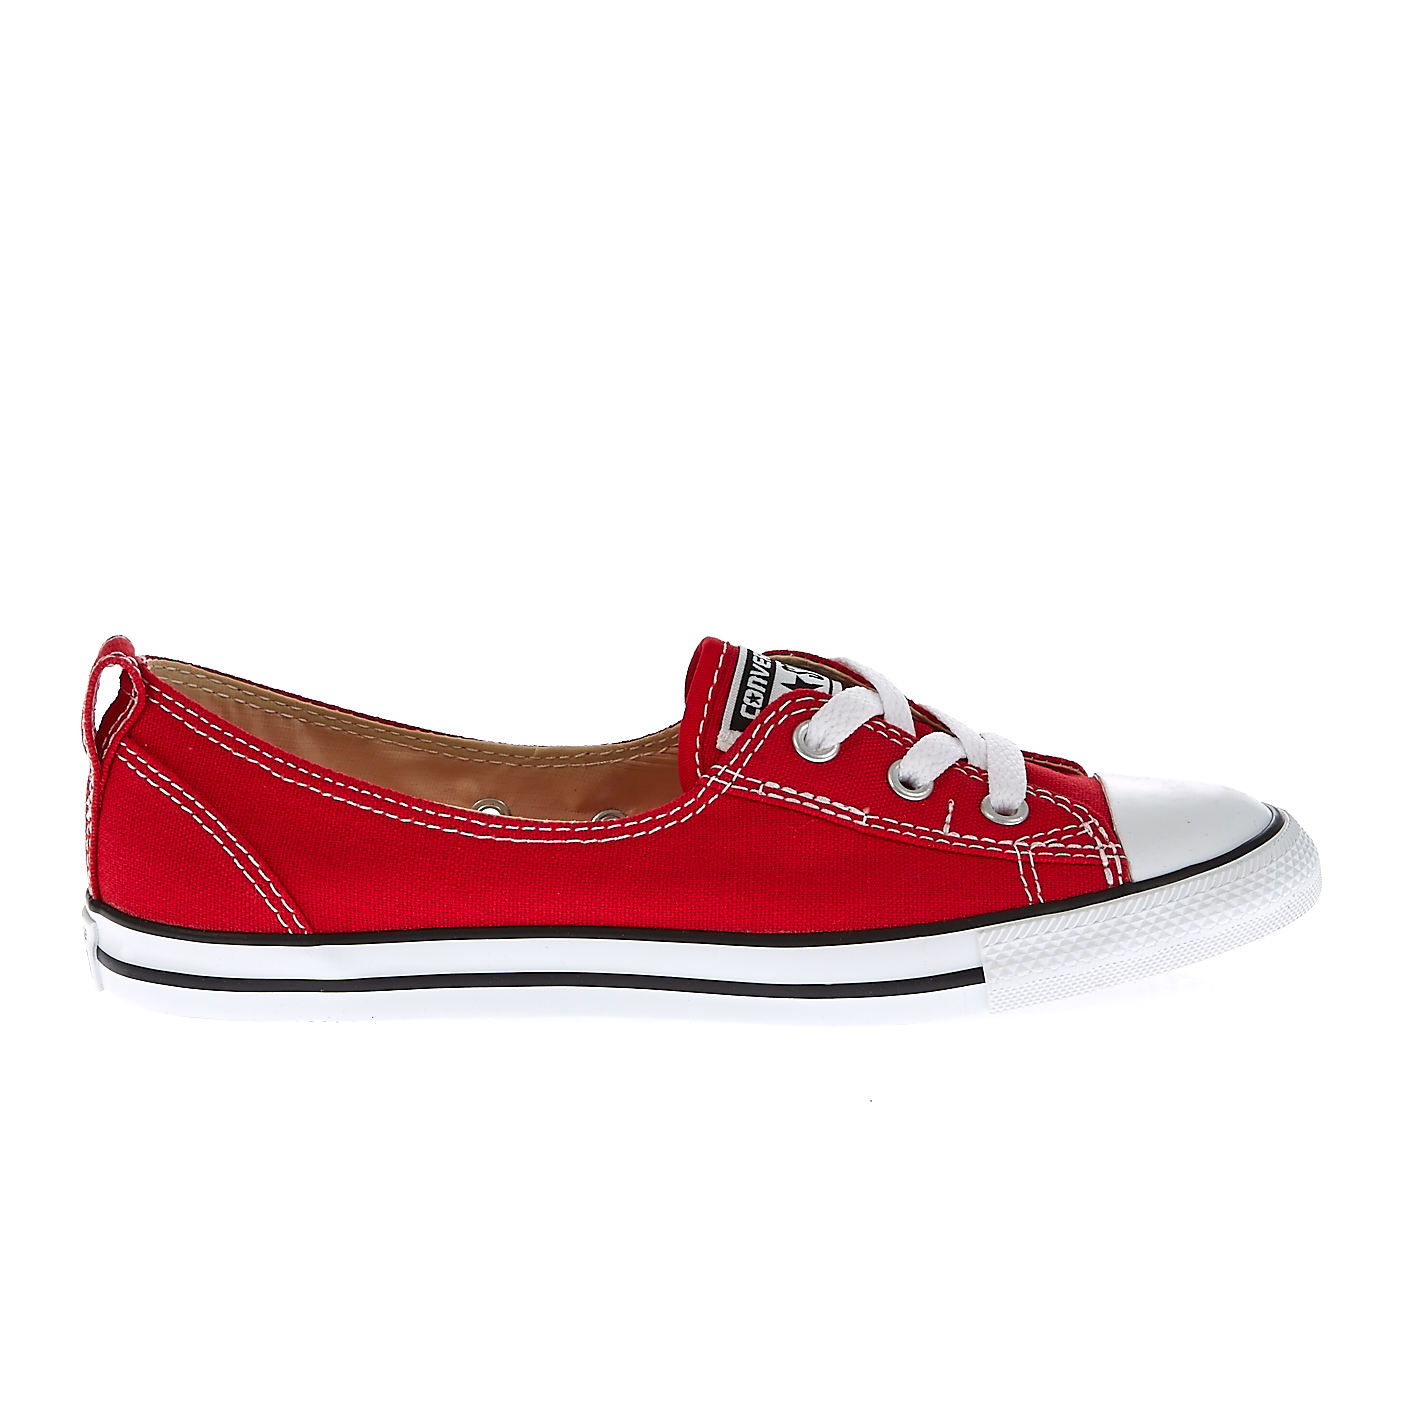 CONVERSE - Γυναικεία παπούτσια Chuck Taylor κόκκινα